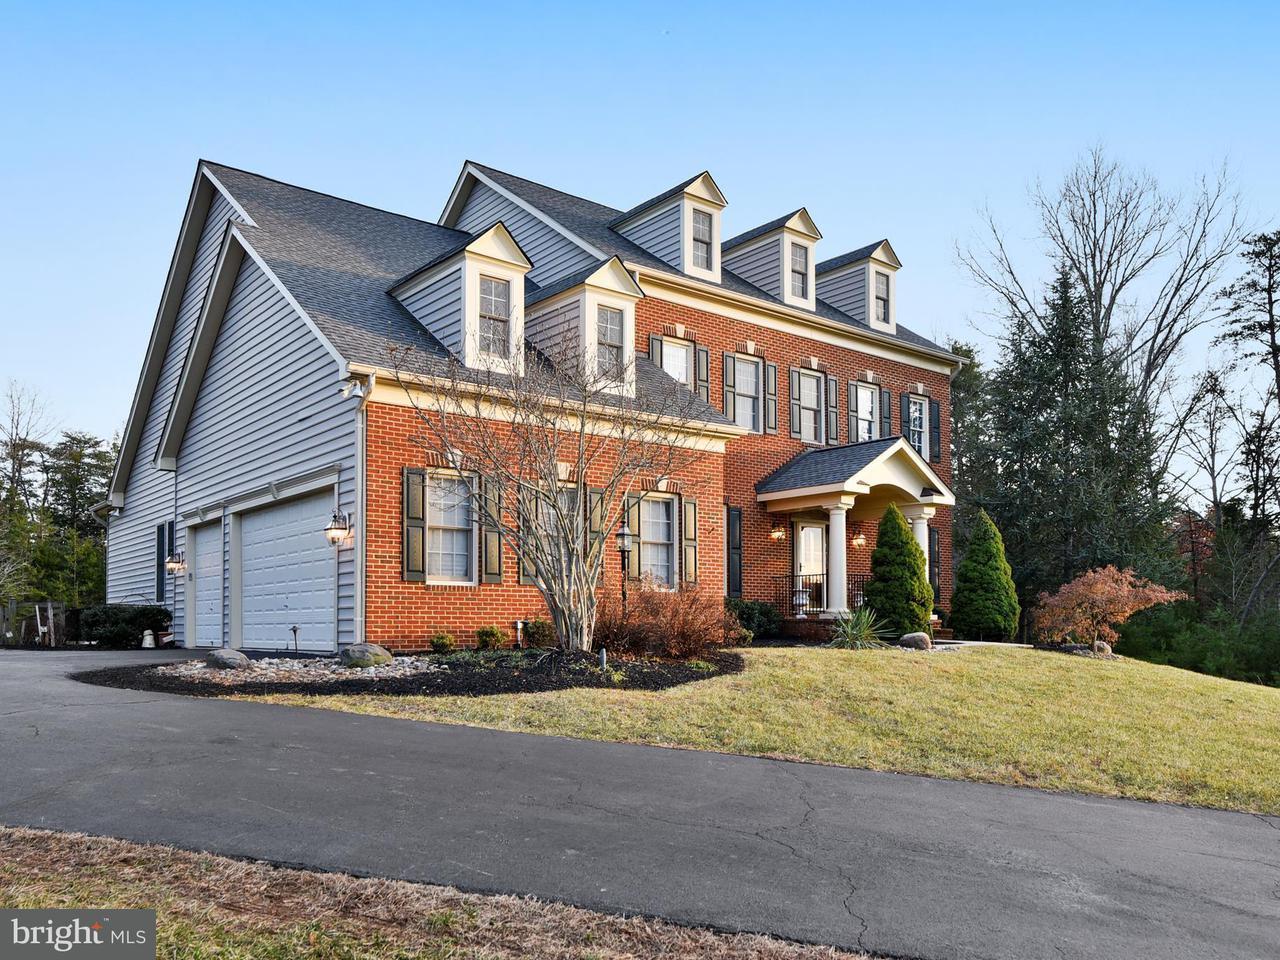 Casa Unifamiliar por un Venta en 42849 Iron Bit Place 42849 Iron Bit Place Chantilly, Virginia 20152 Estados Unidos